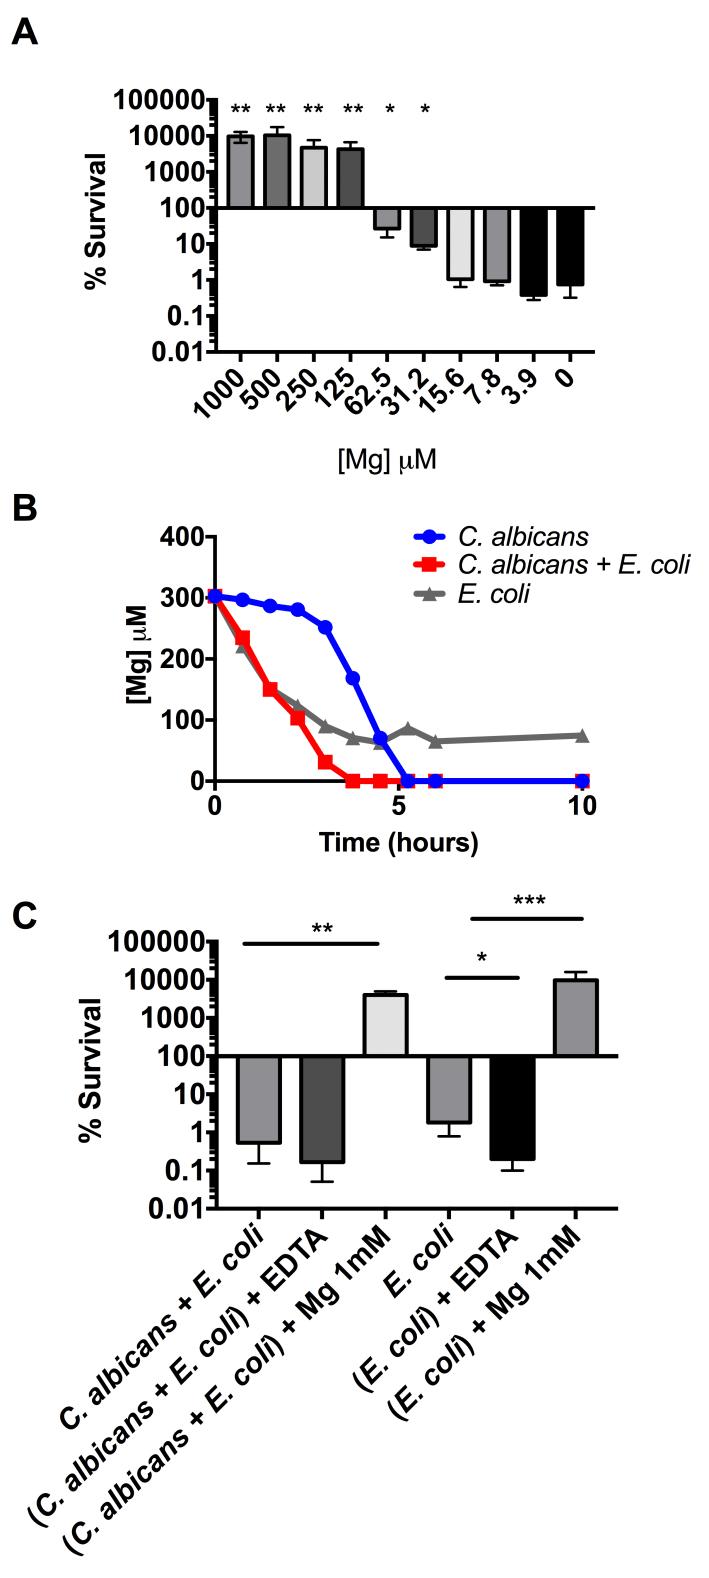 E. coli toxicity depends on magnesium limitation. (A